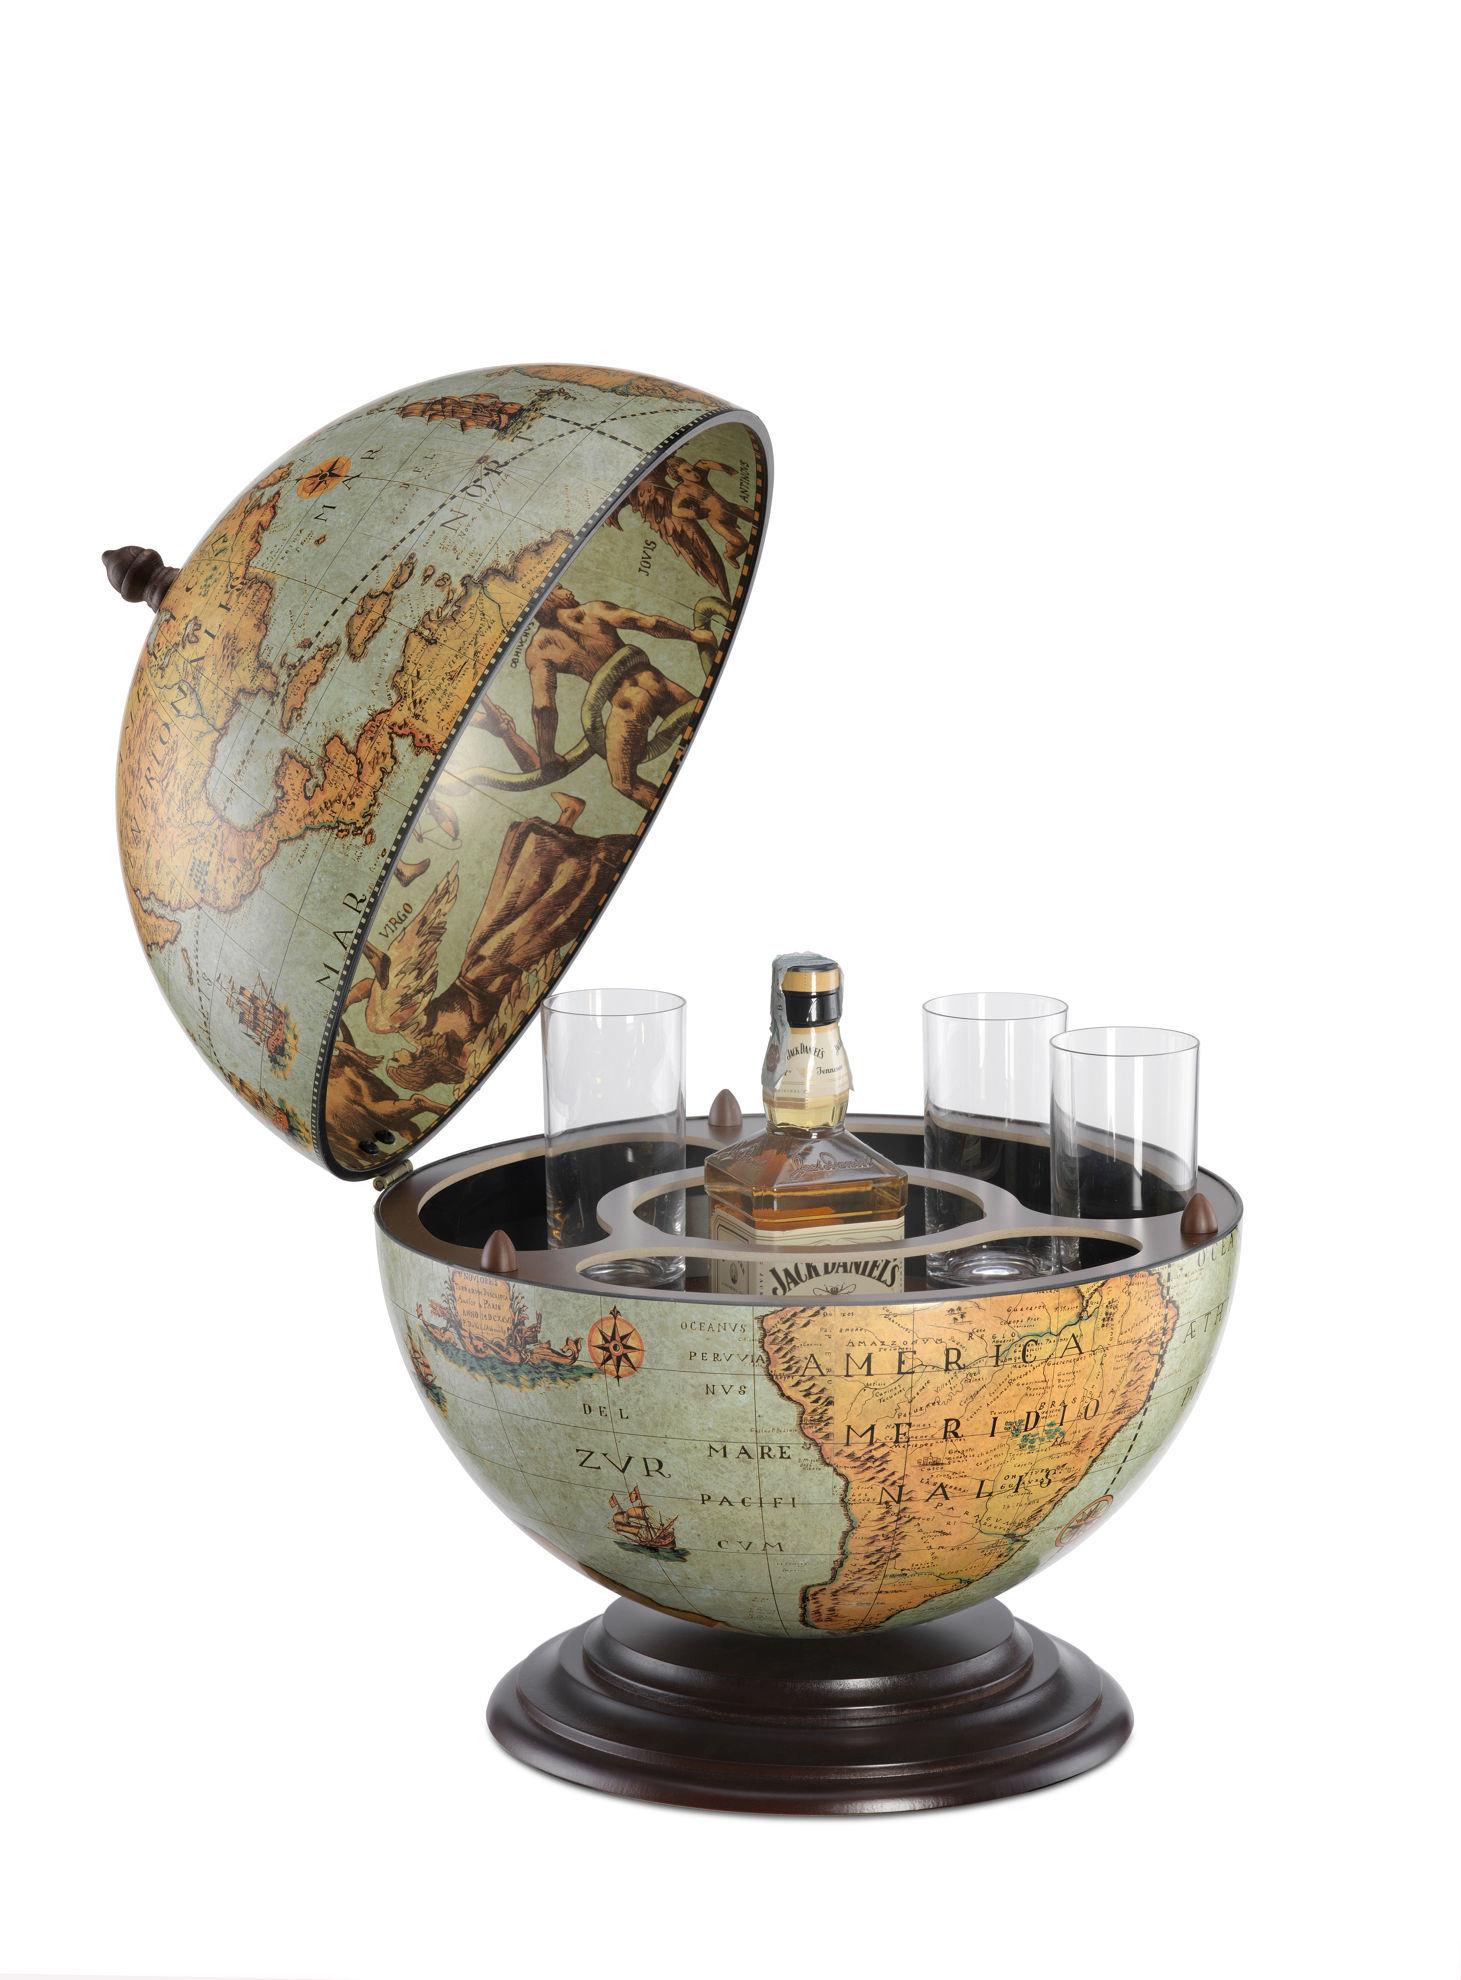 Obrázek Bar Globus Nettuno Laguna